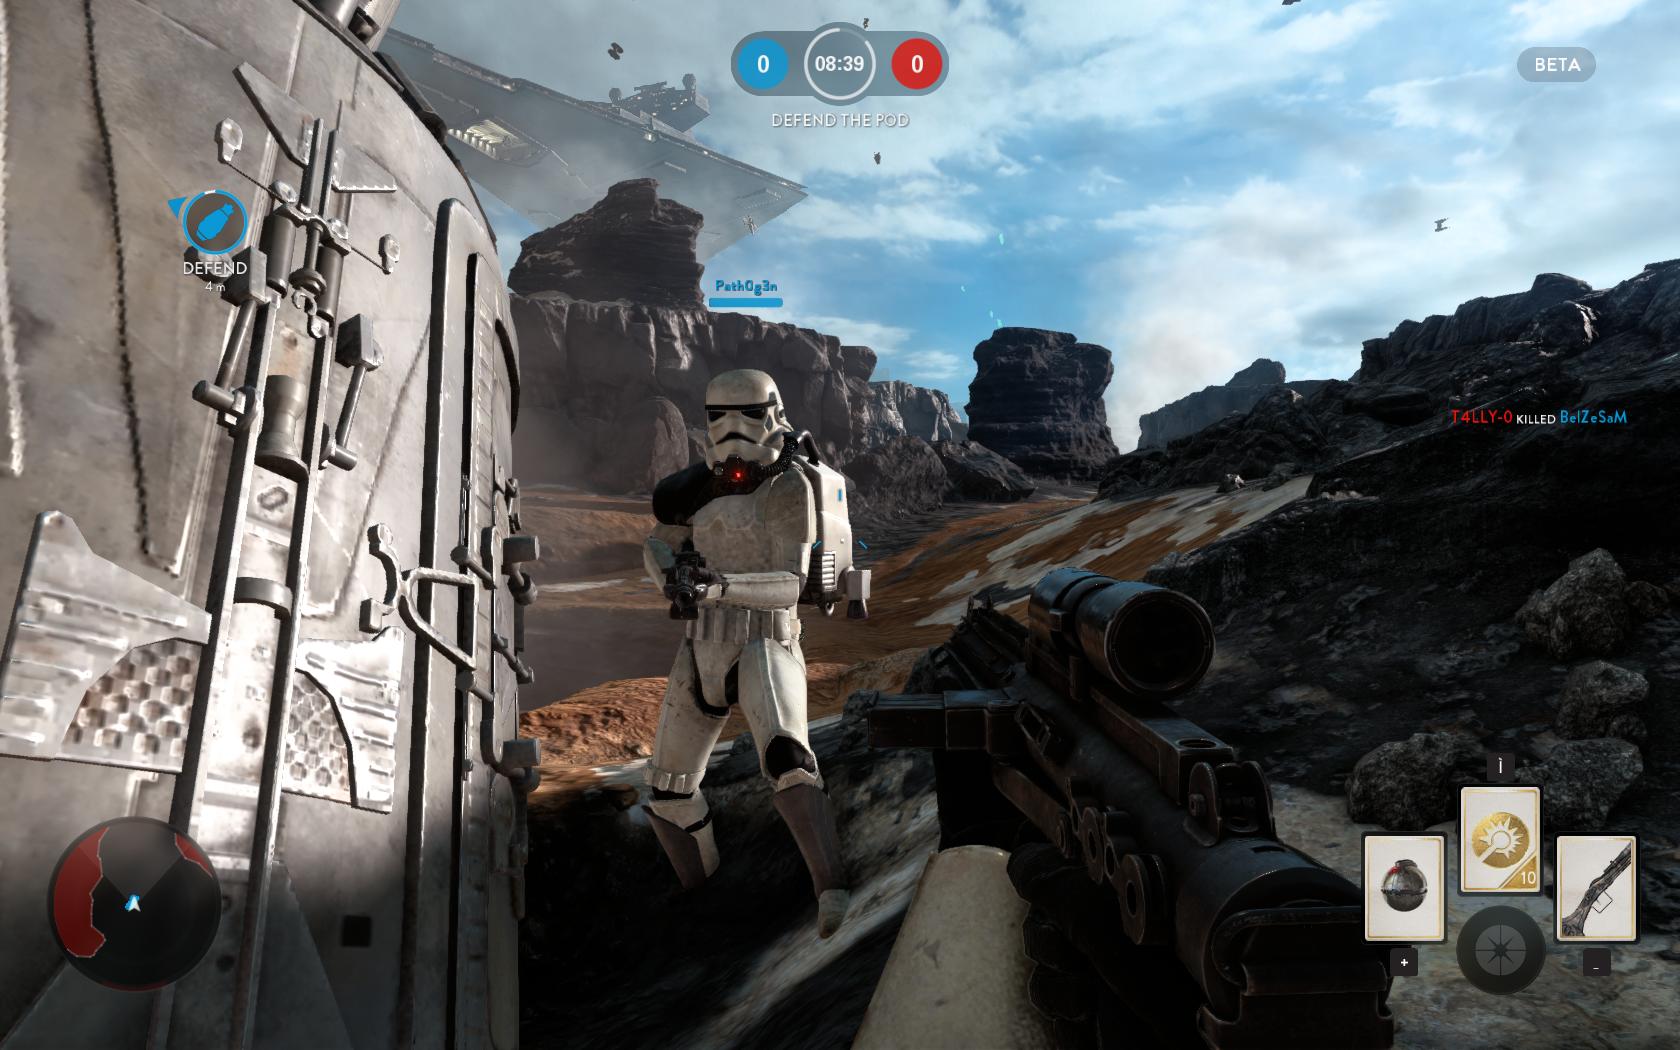 Star Wars: Battlefront - dojmy z bety 114627